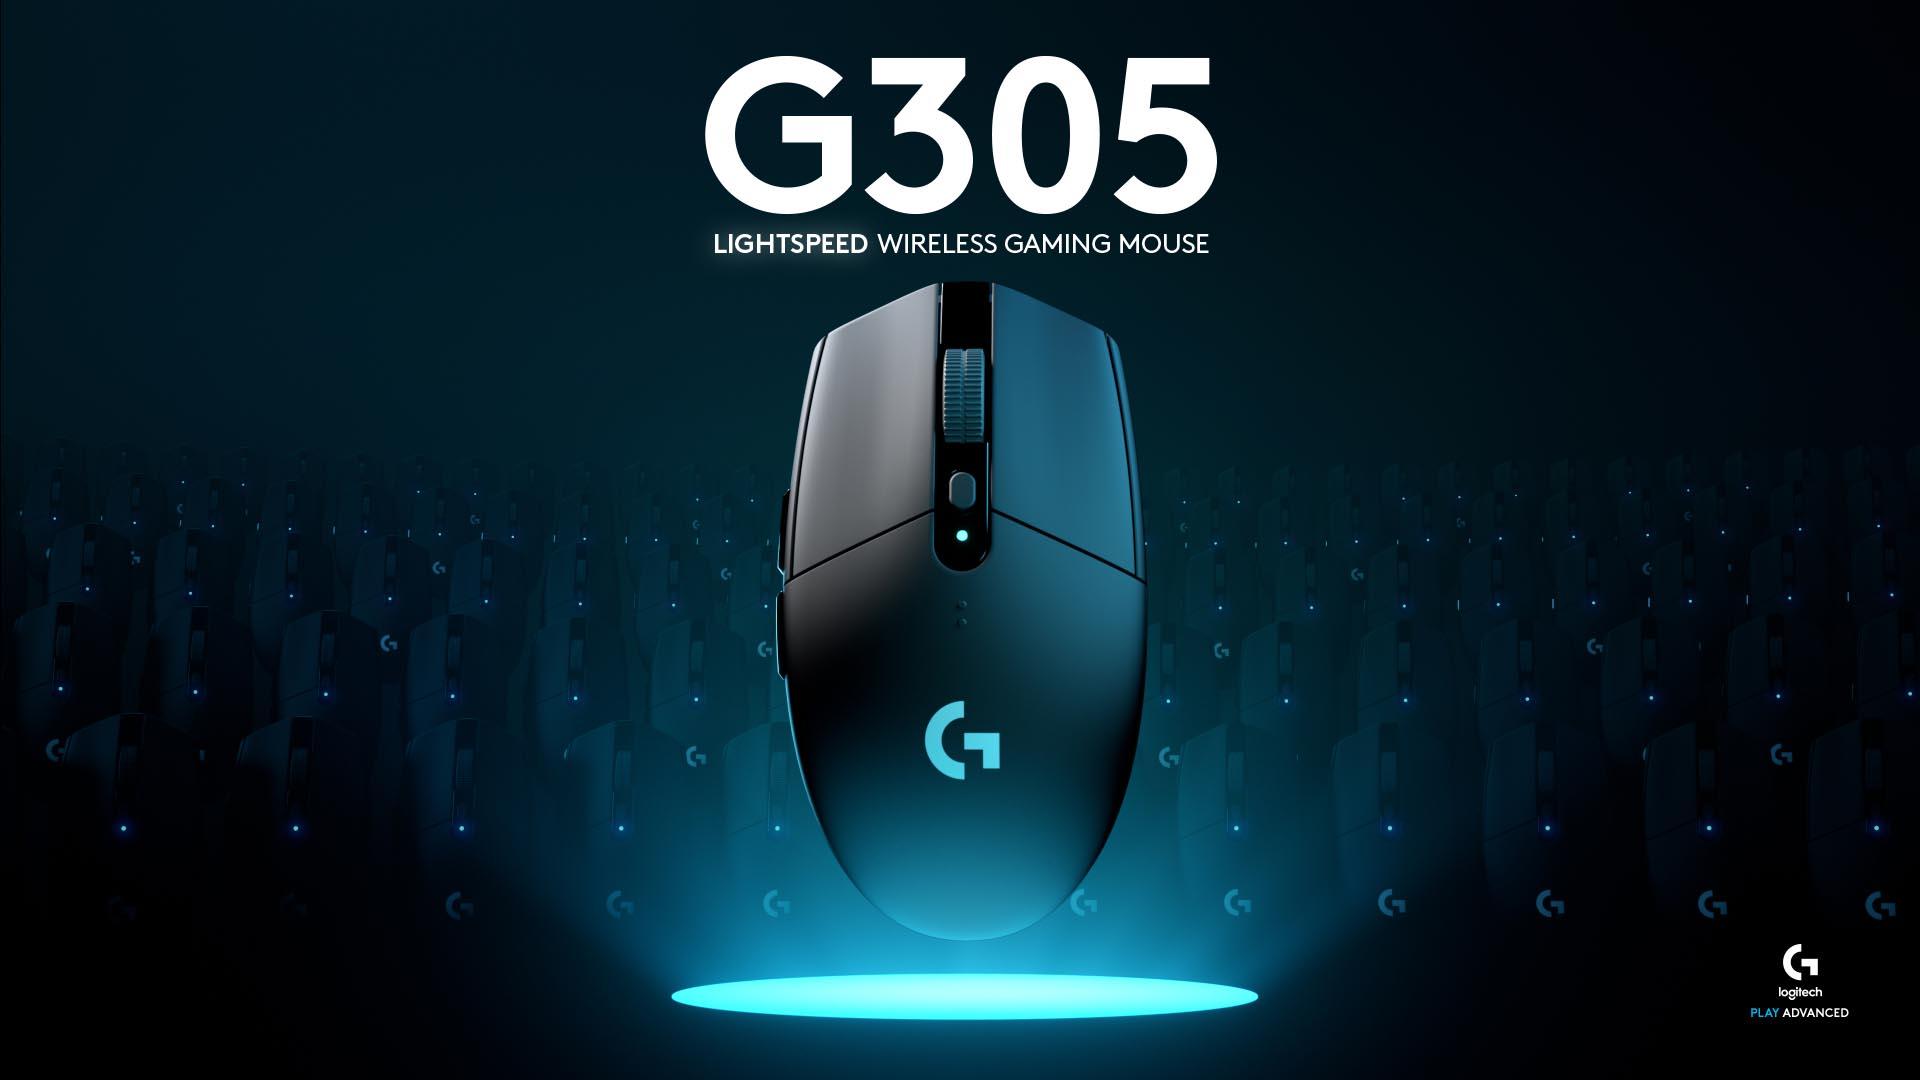 Logitech G305 Lightspeed: miglior mouse wireless economico